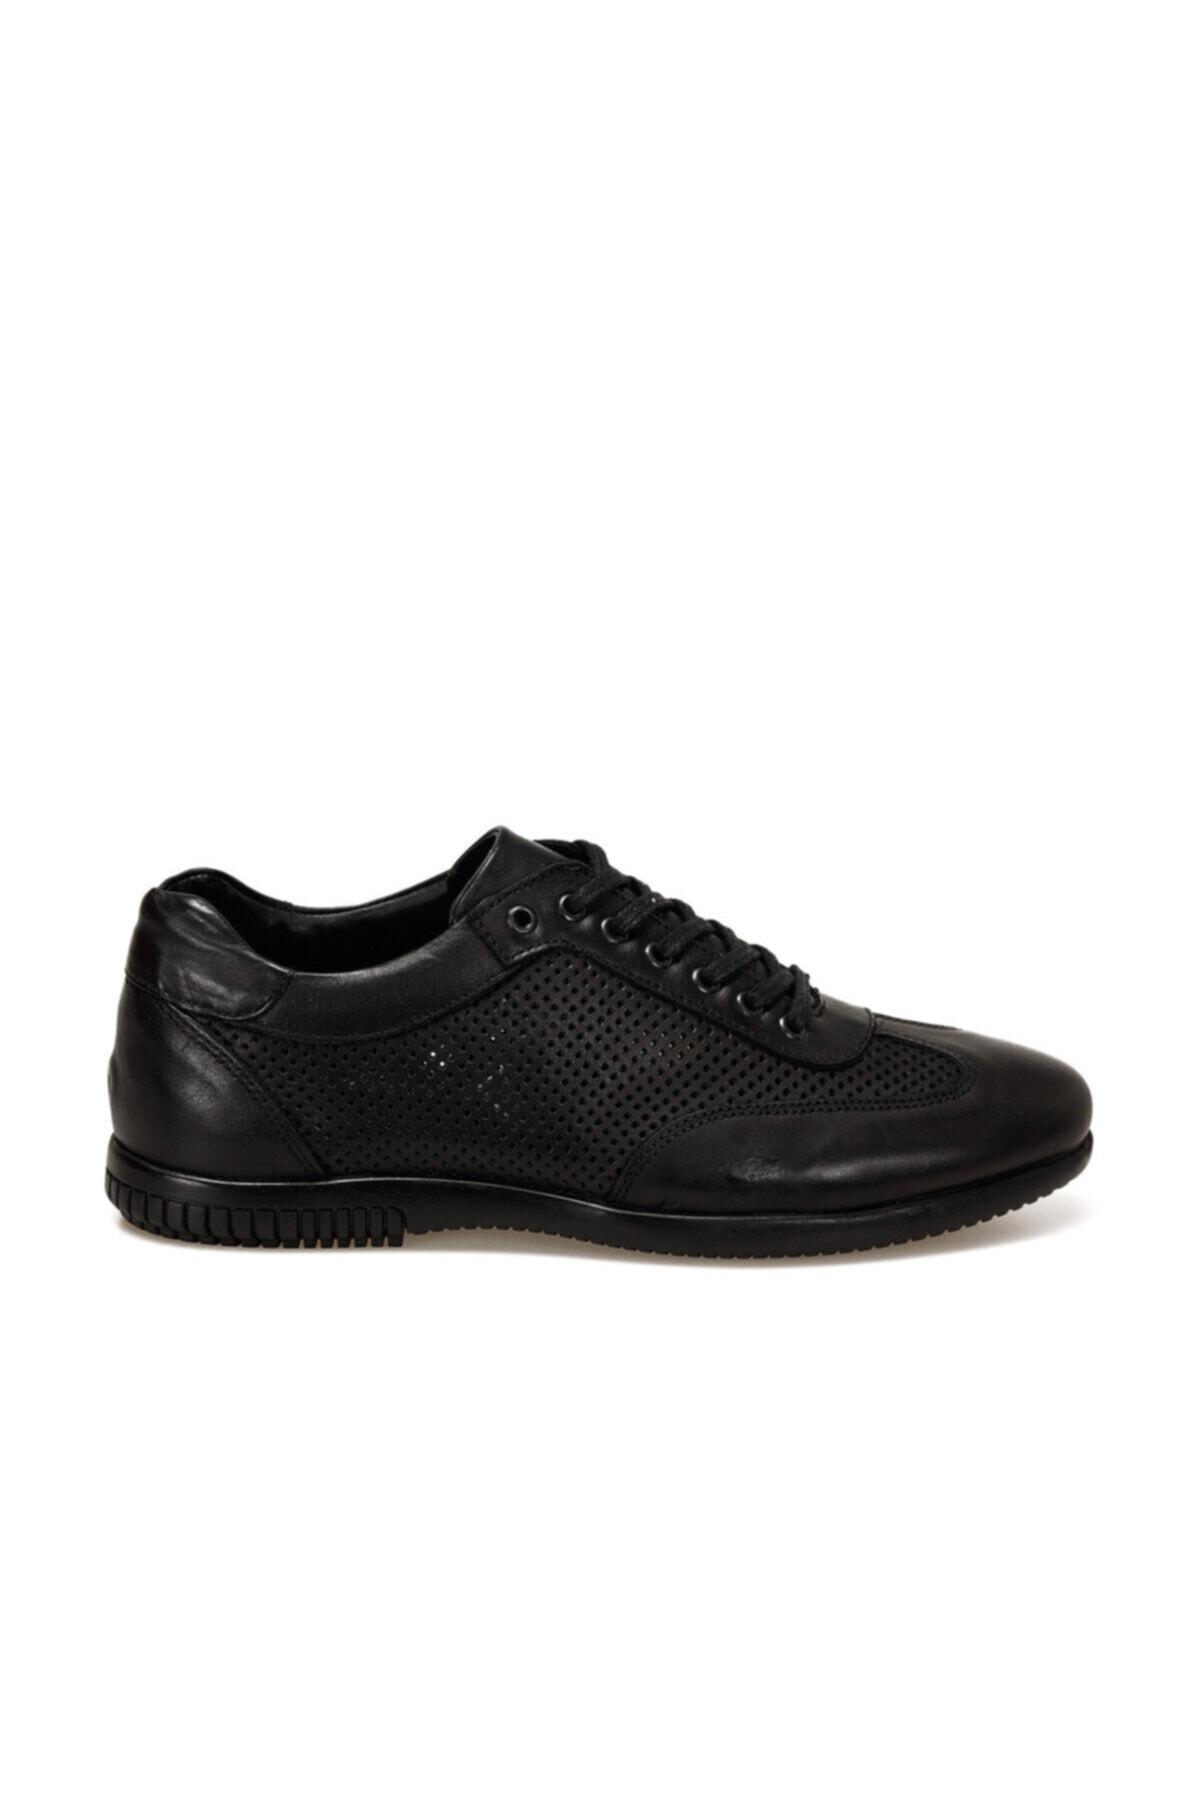 OXIDE Int1120y111 Siyah Erkek Ayakkabı 2